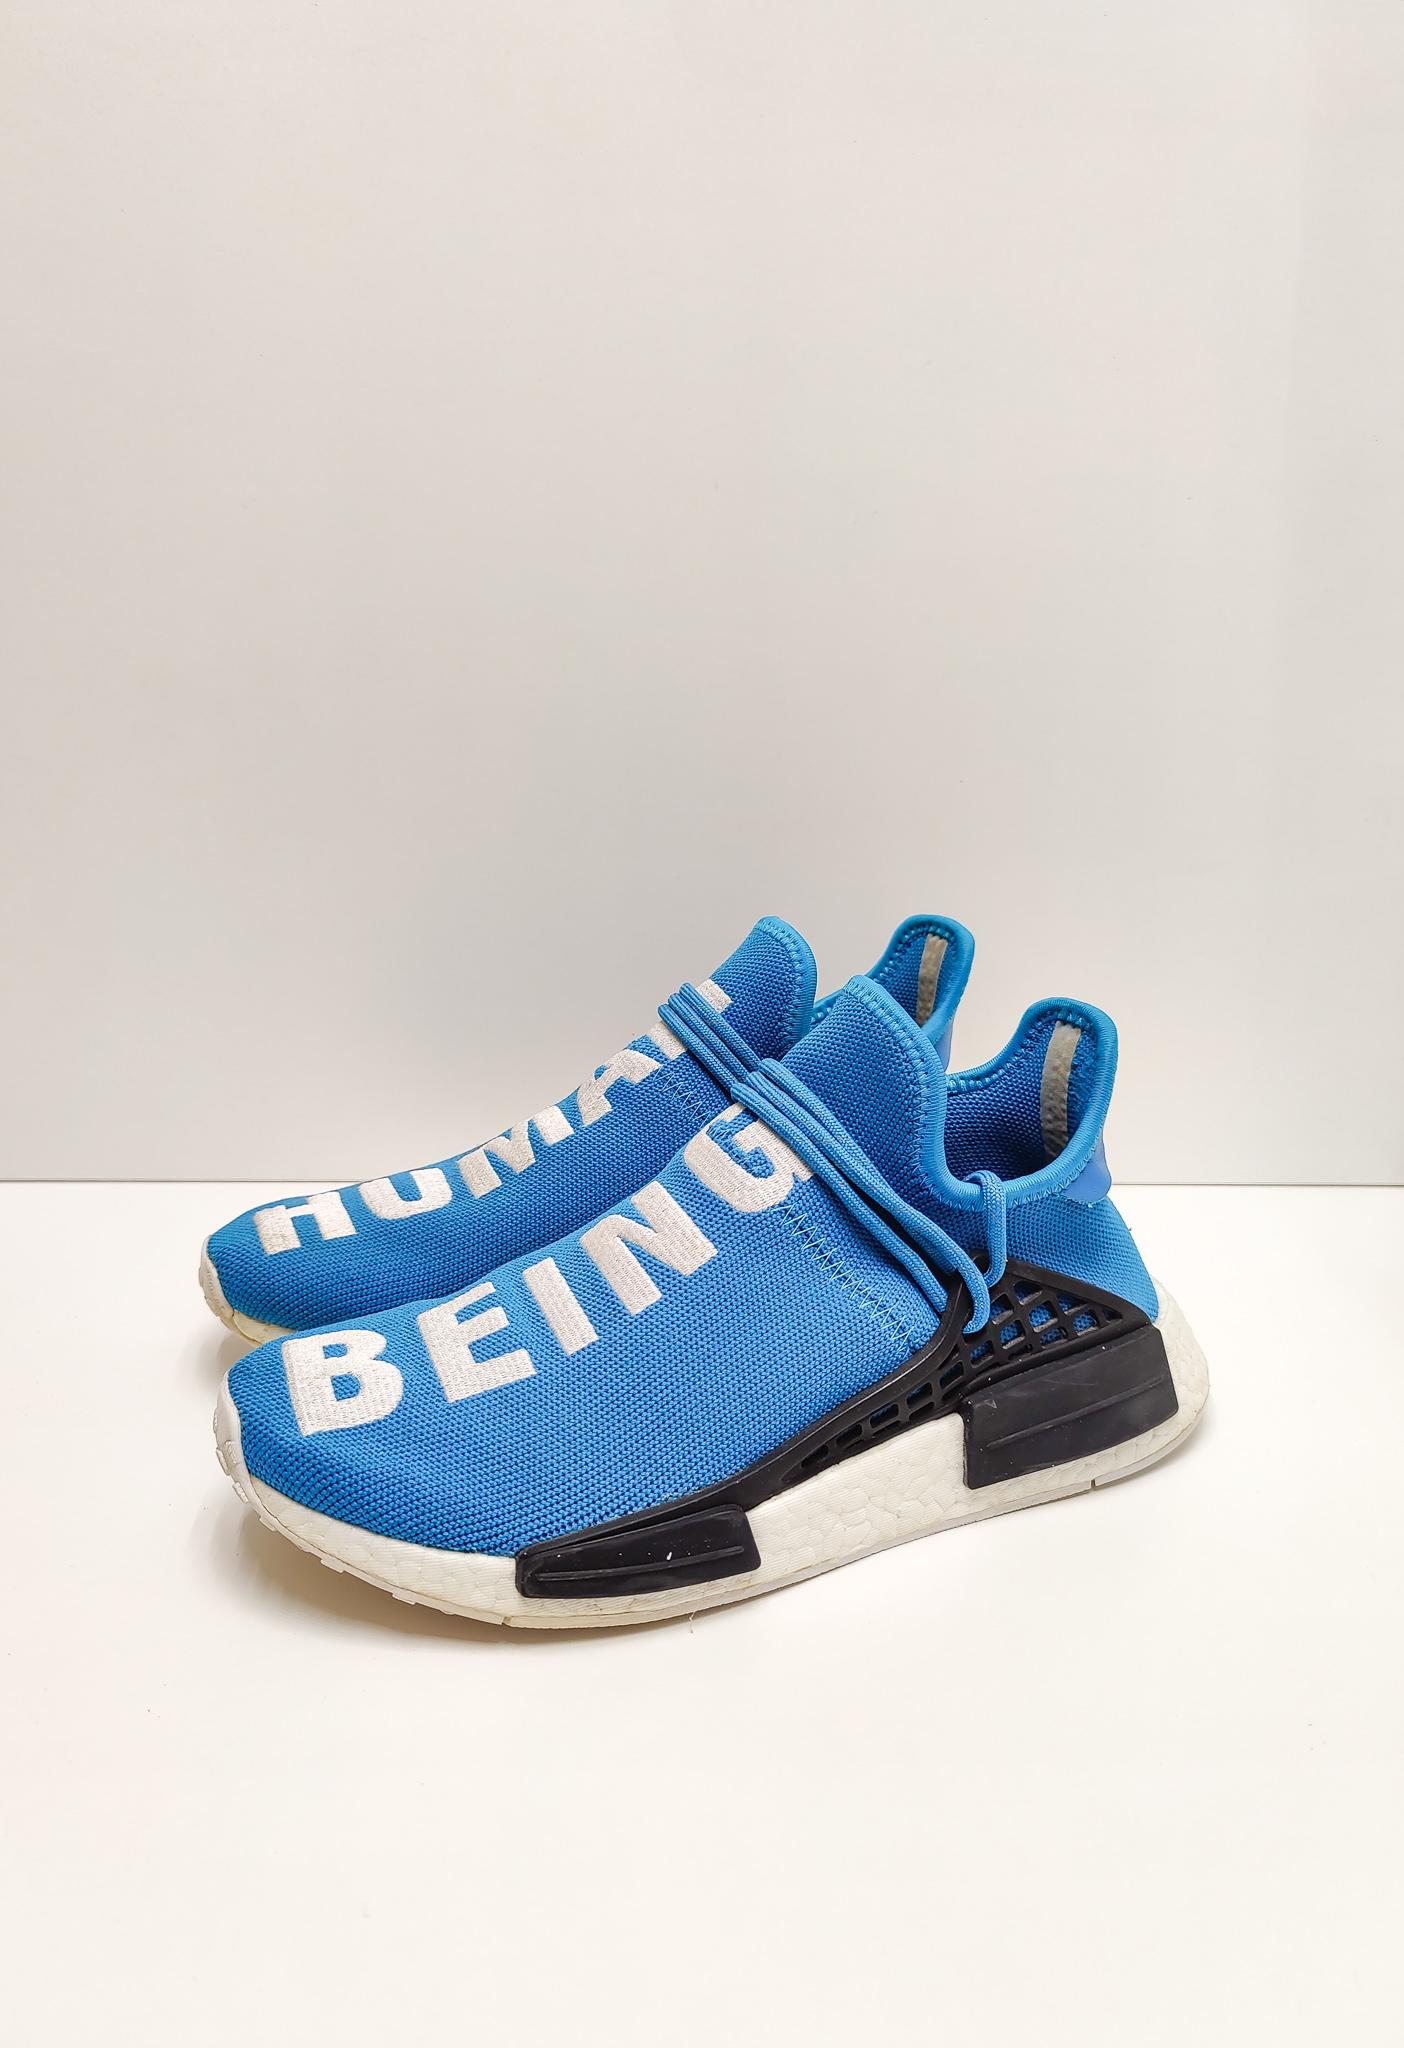 Adidas NMD HU Pharrell Human Being Sharp Blue